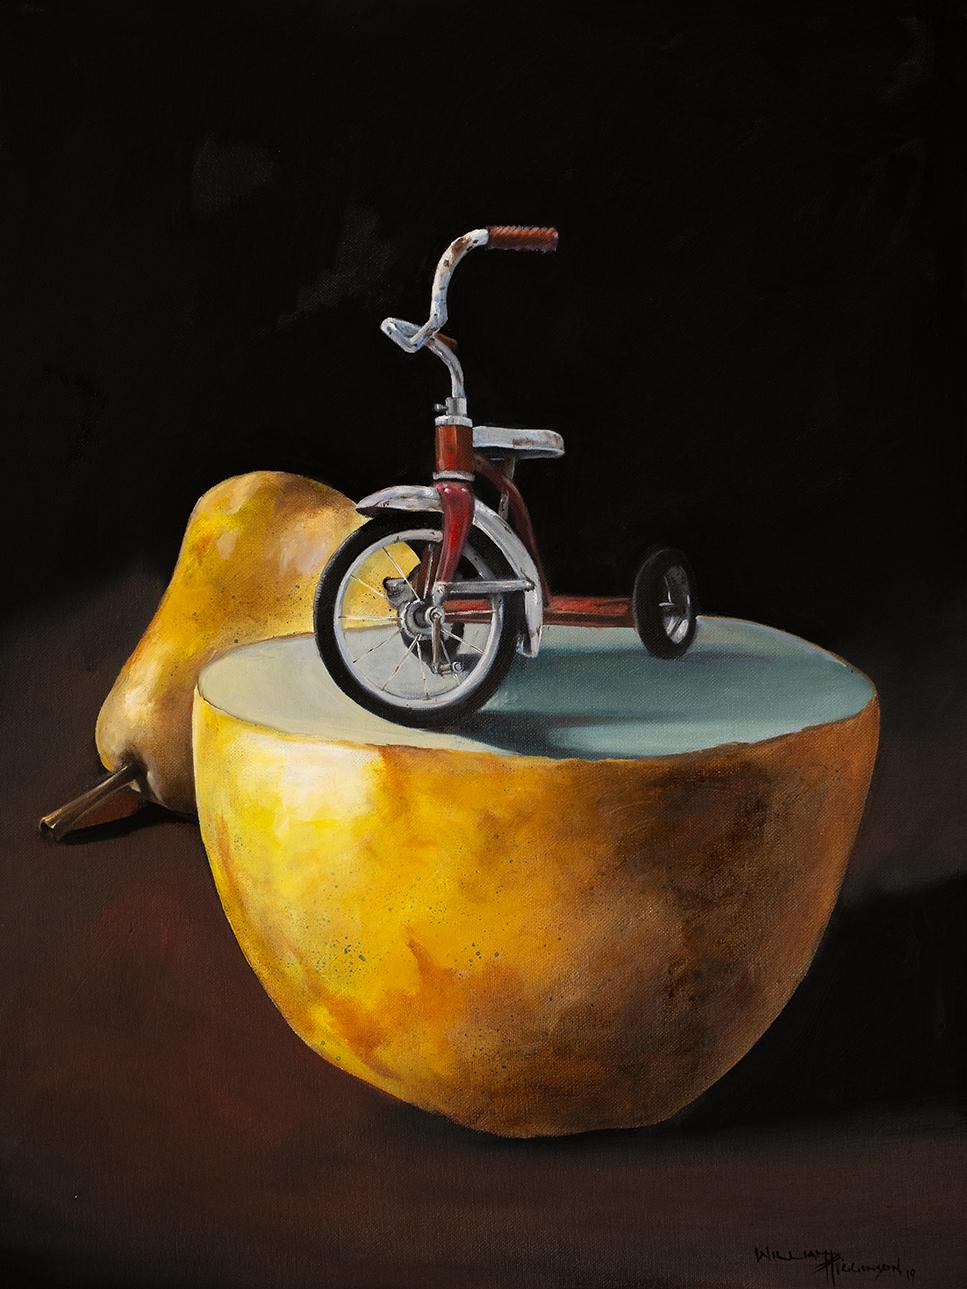 Pyriforma incubandi tres wheeler surrealism oil painting william d higginson.jpg